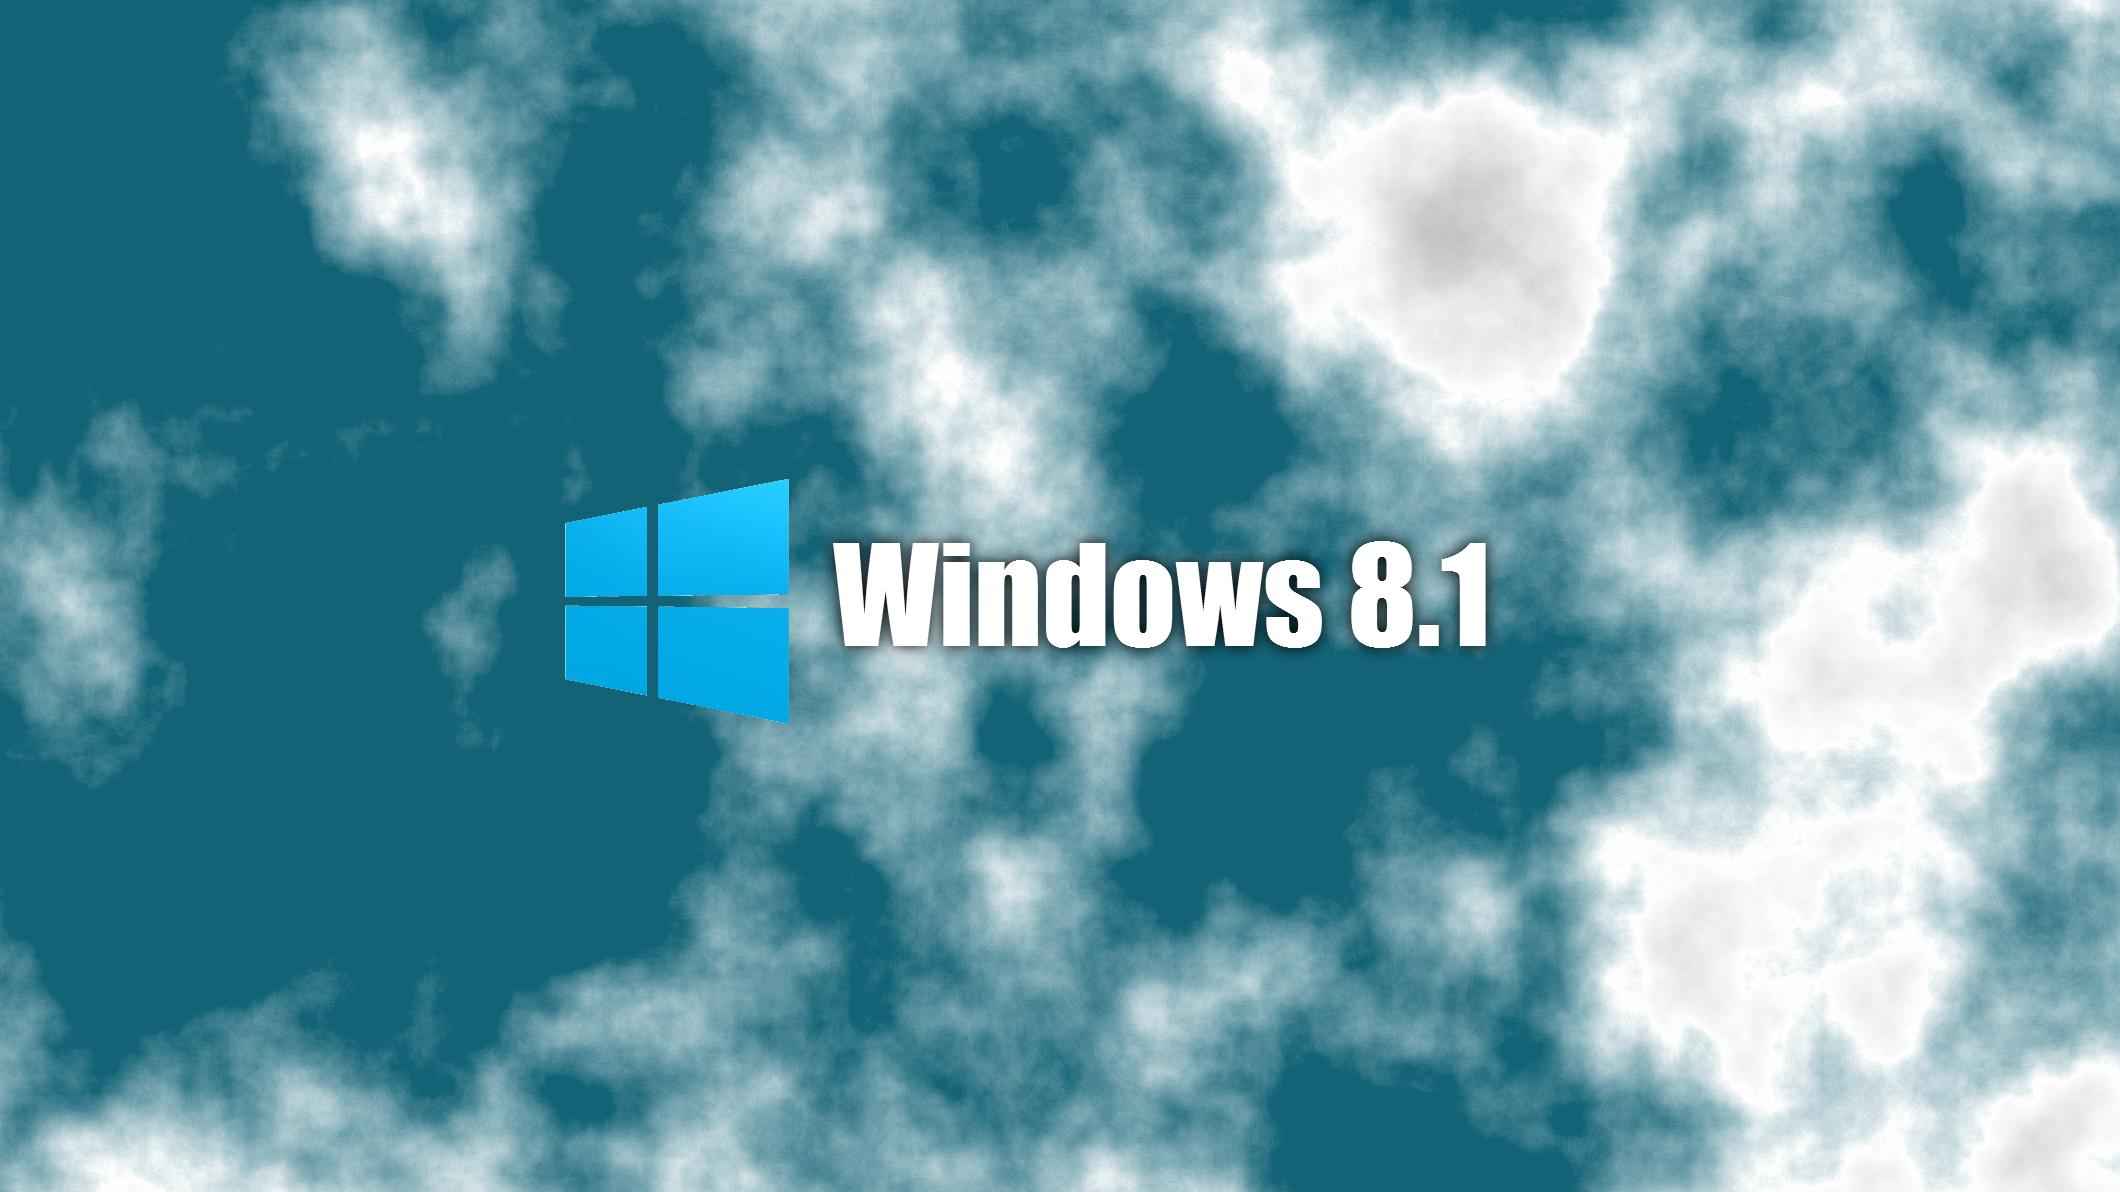 windows 8.1 desktop backgroundtheradiationmaster on deviantart